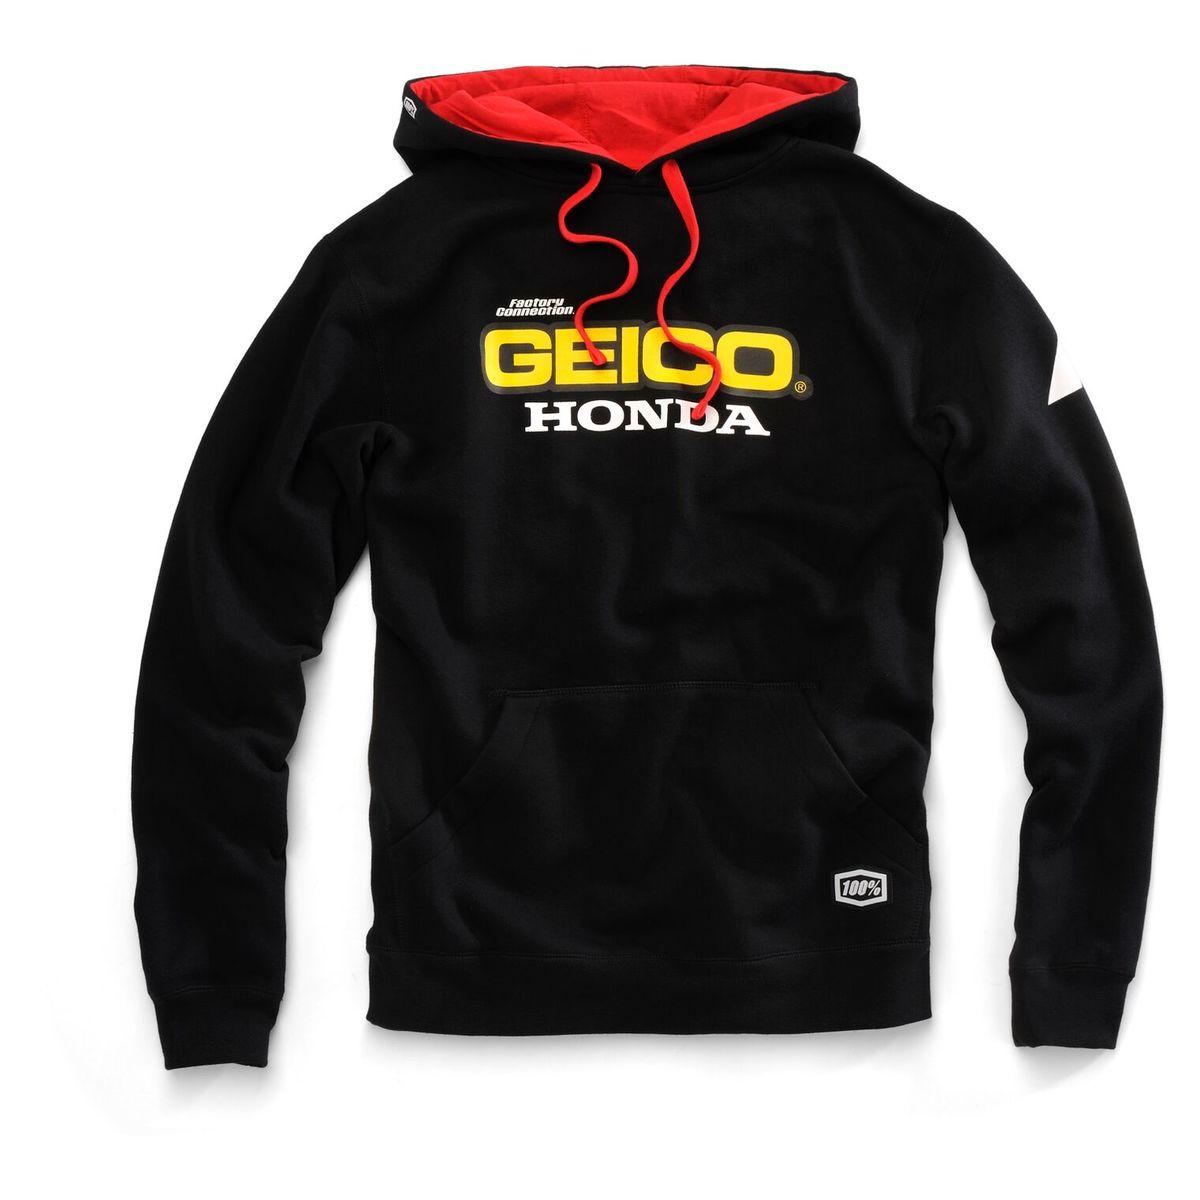 15f36c5f27d 100% Team Geico Honda Base Hoody - Motorcycle House